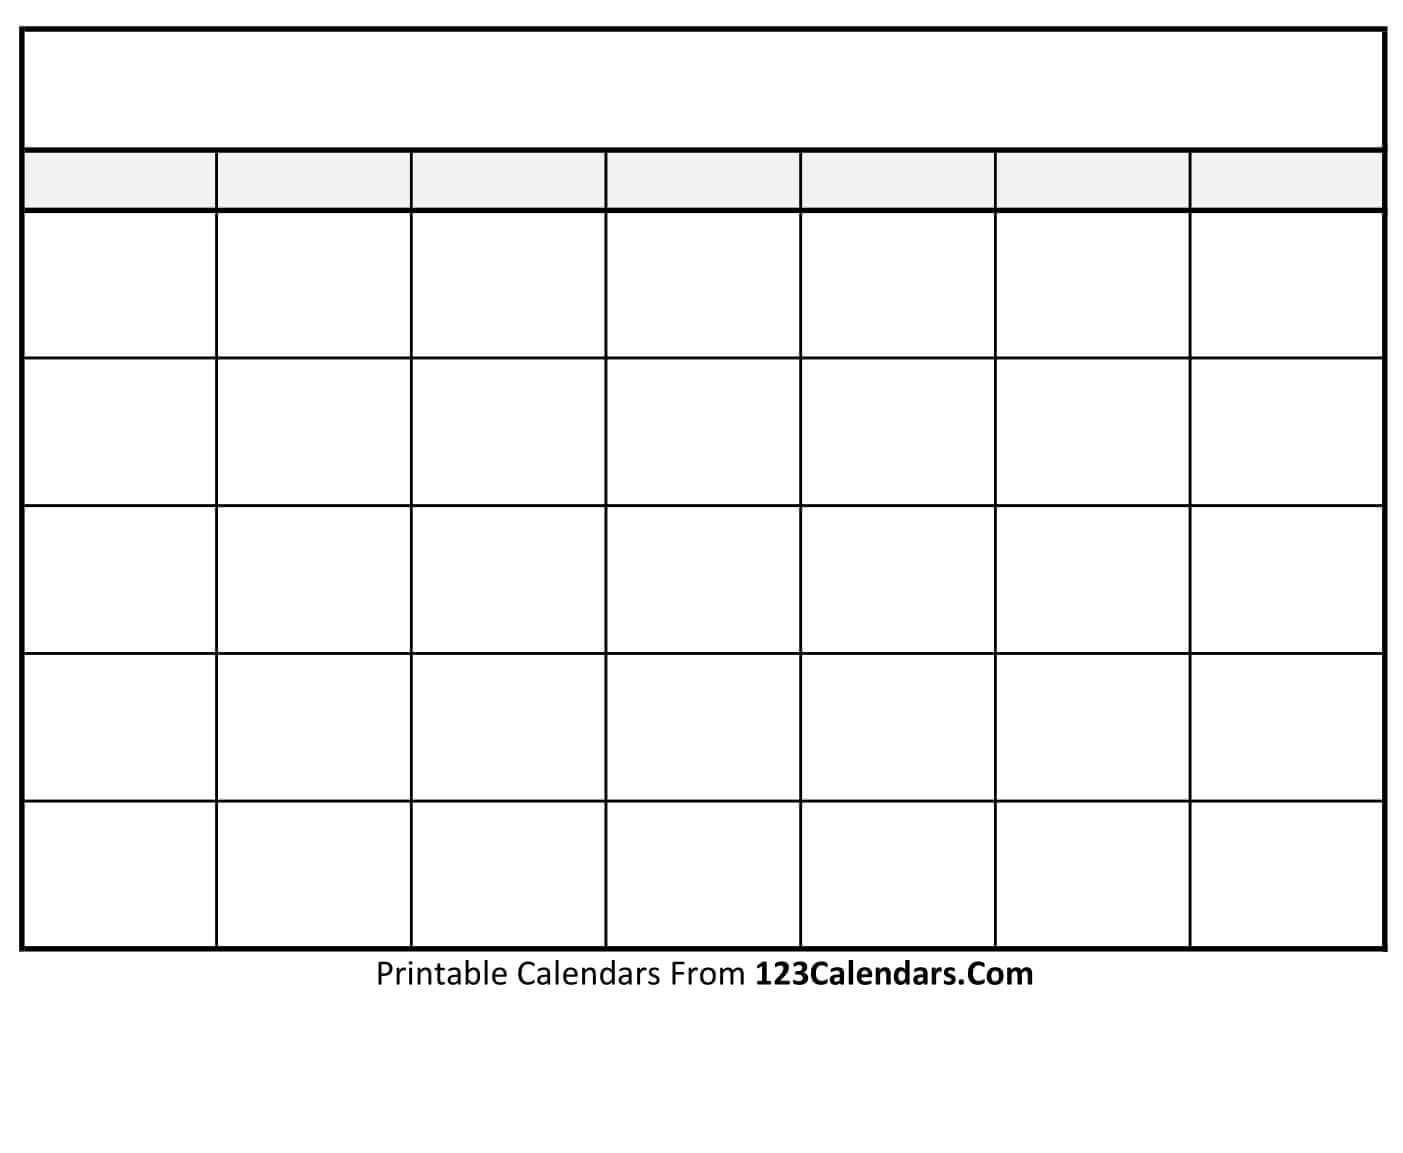 Free Printable Blank Calendar | 123Calendars within Printable Blank Calendar Template